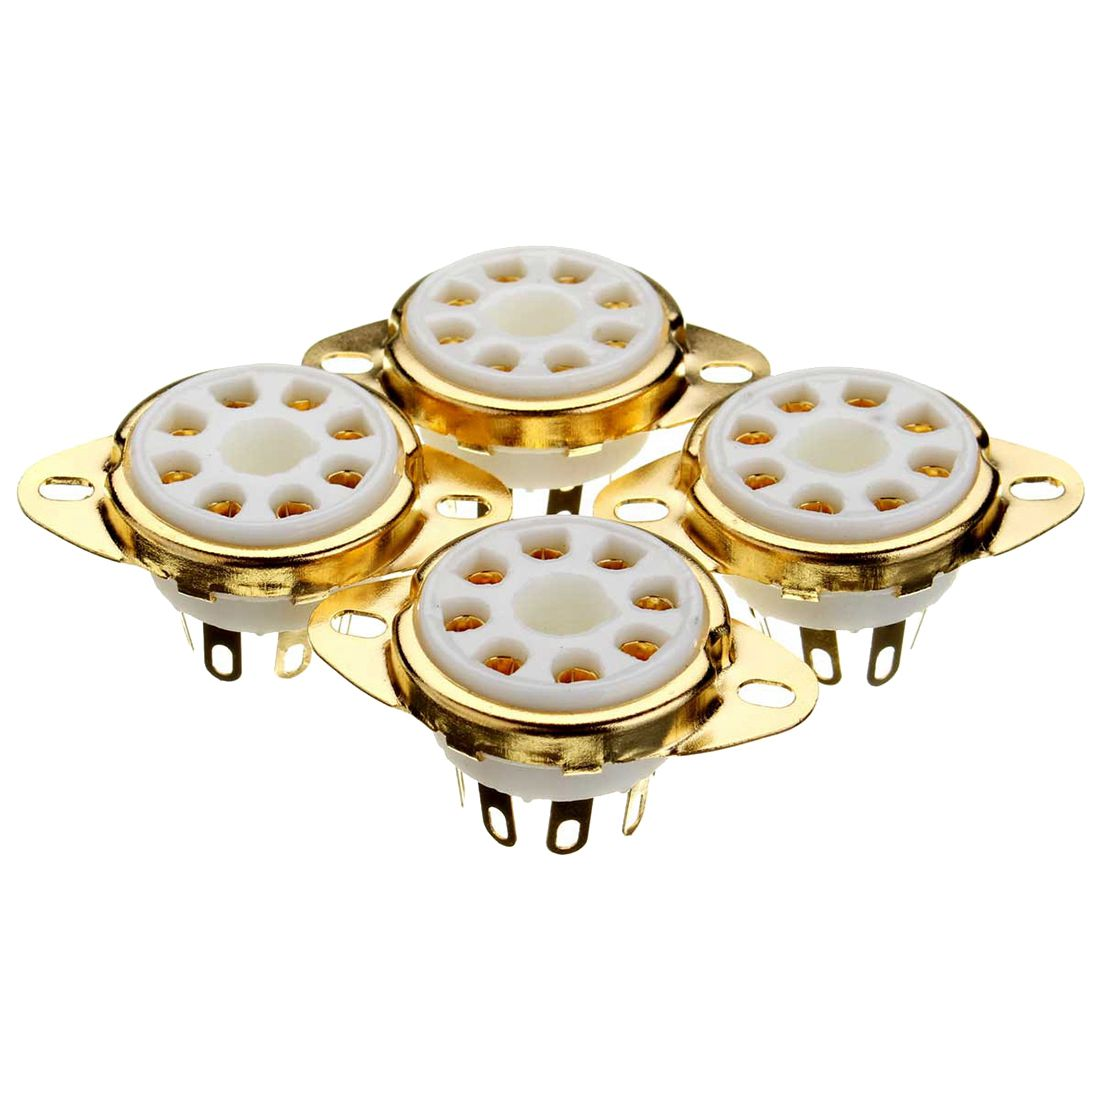 CSS 4PC 8 Pin Ceramic Socket Tube Top Vacuum Octal Value For KT88 EL34 6V6 6650 274B 2pcs ceramic tube socket gzc7 c g tablet 7 pin golden foot for 6c33 fu29 fu19 fu32 fu30